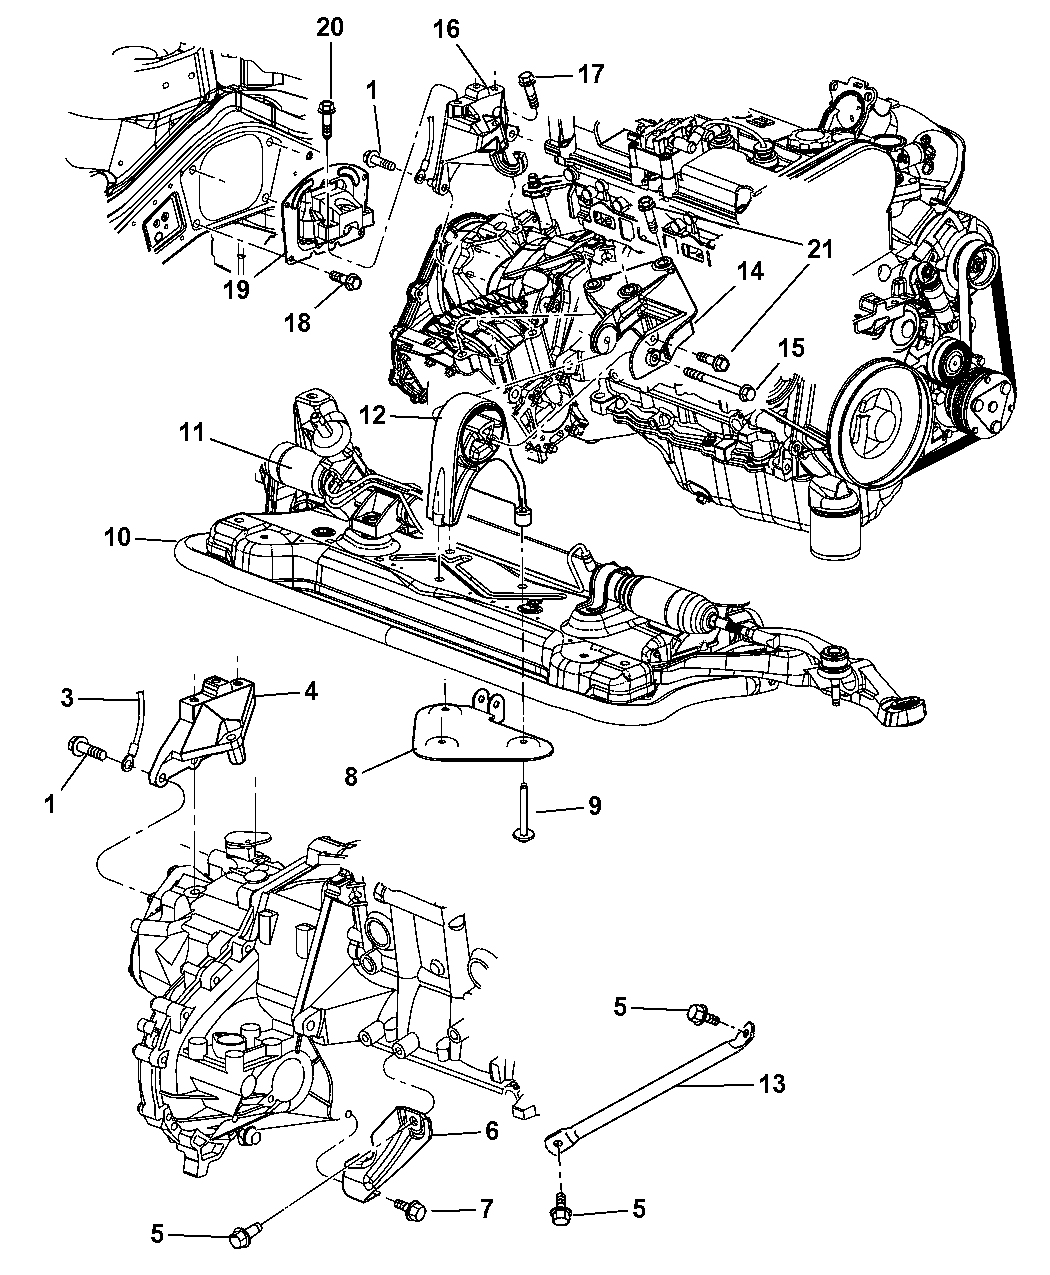 Chrysler Sebring Engine Diagram Wiring Diagram Corsa A Corsa A Pasticceriagele It